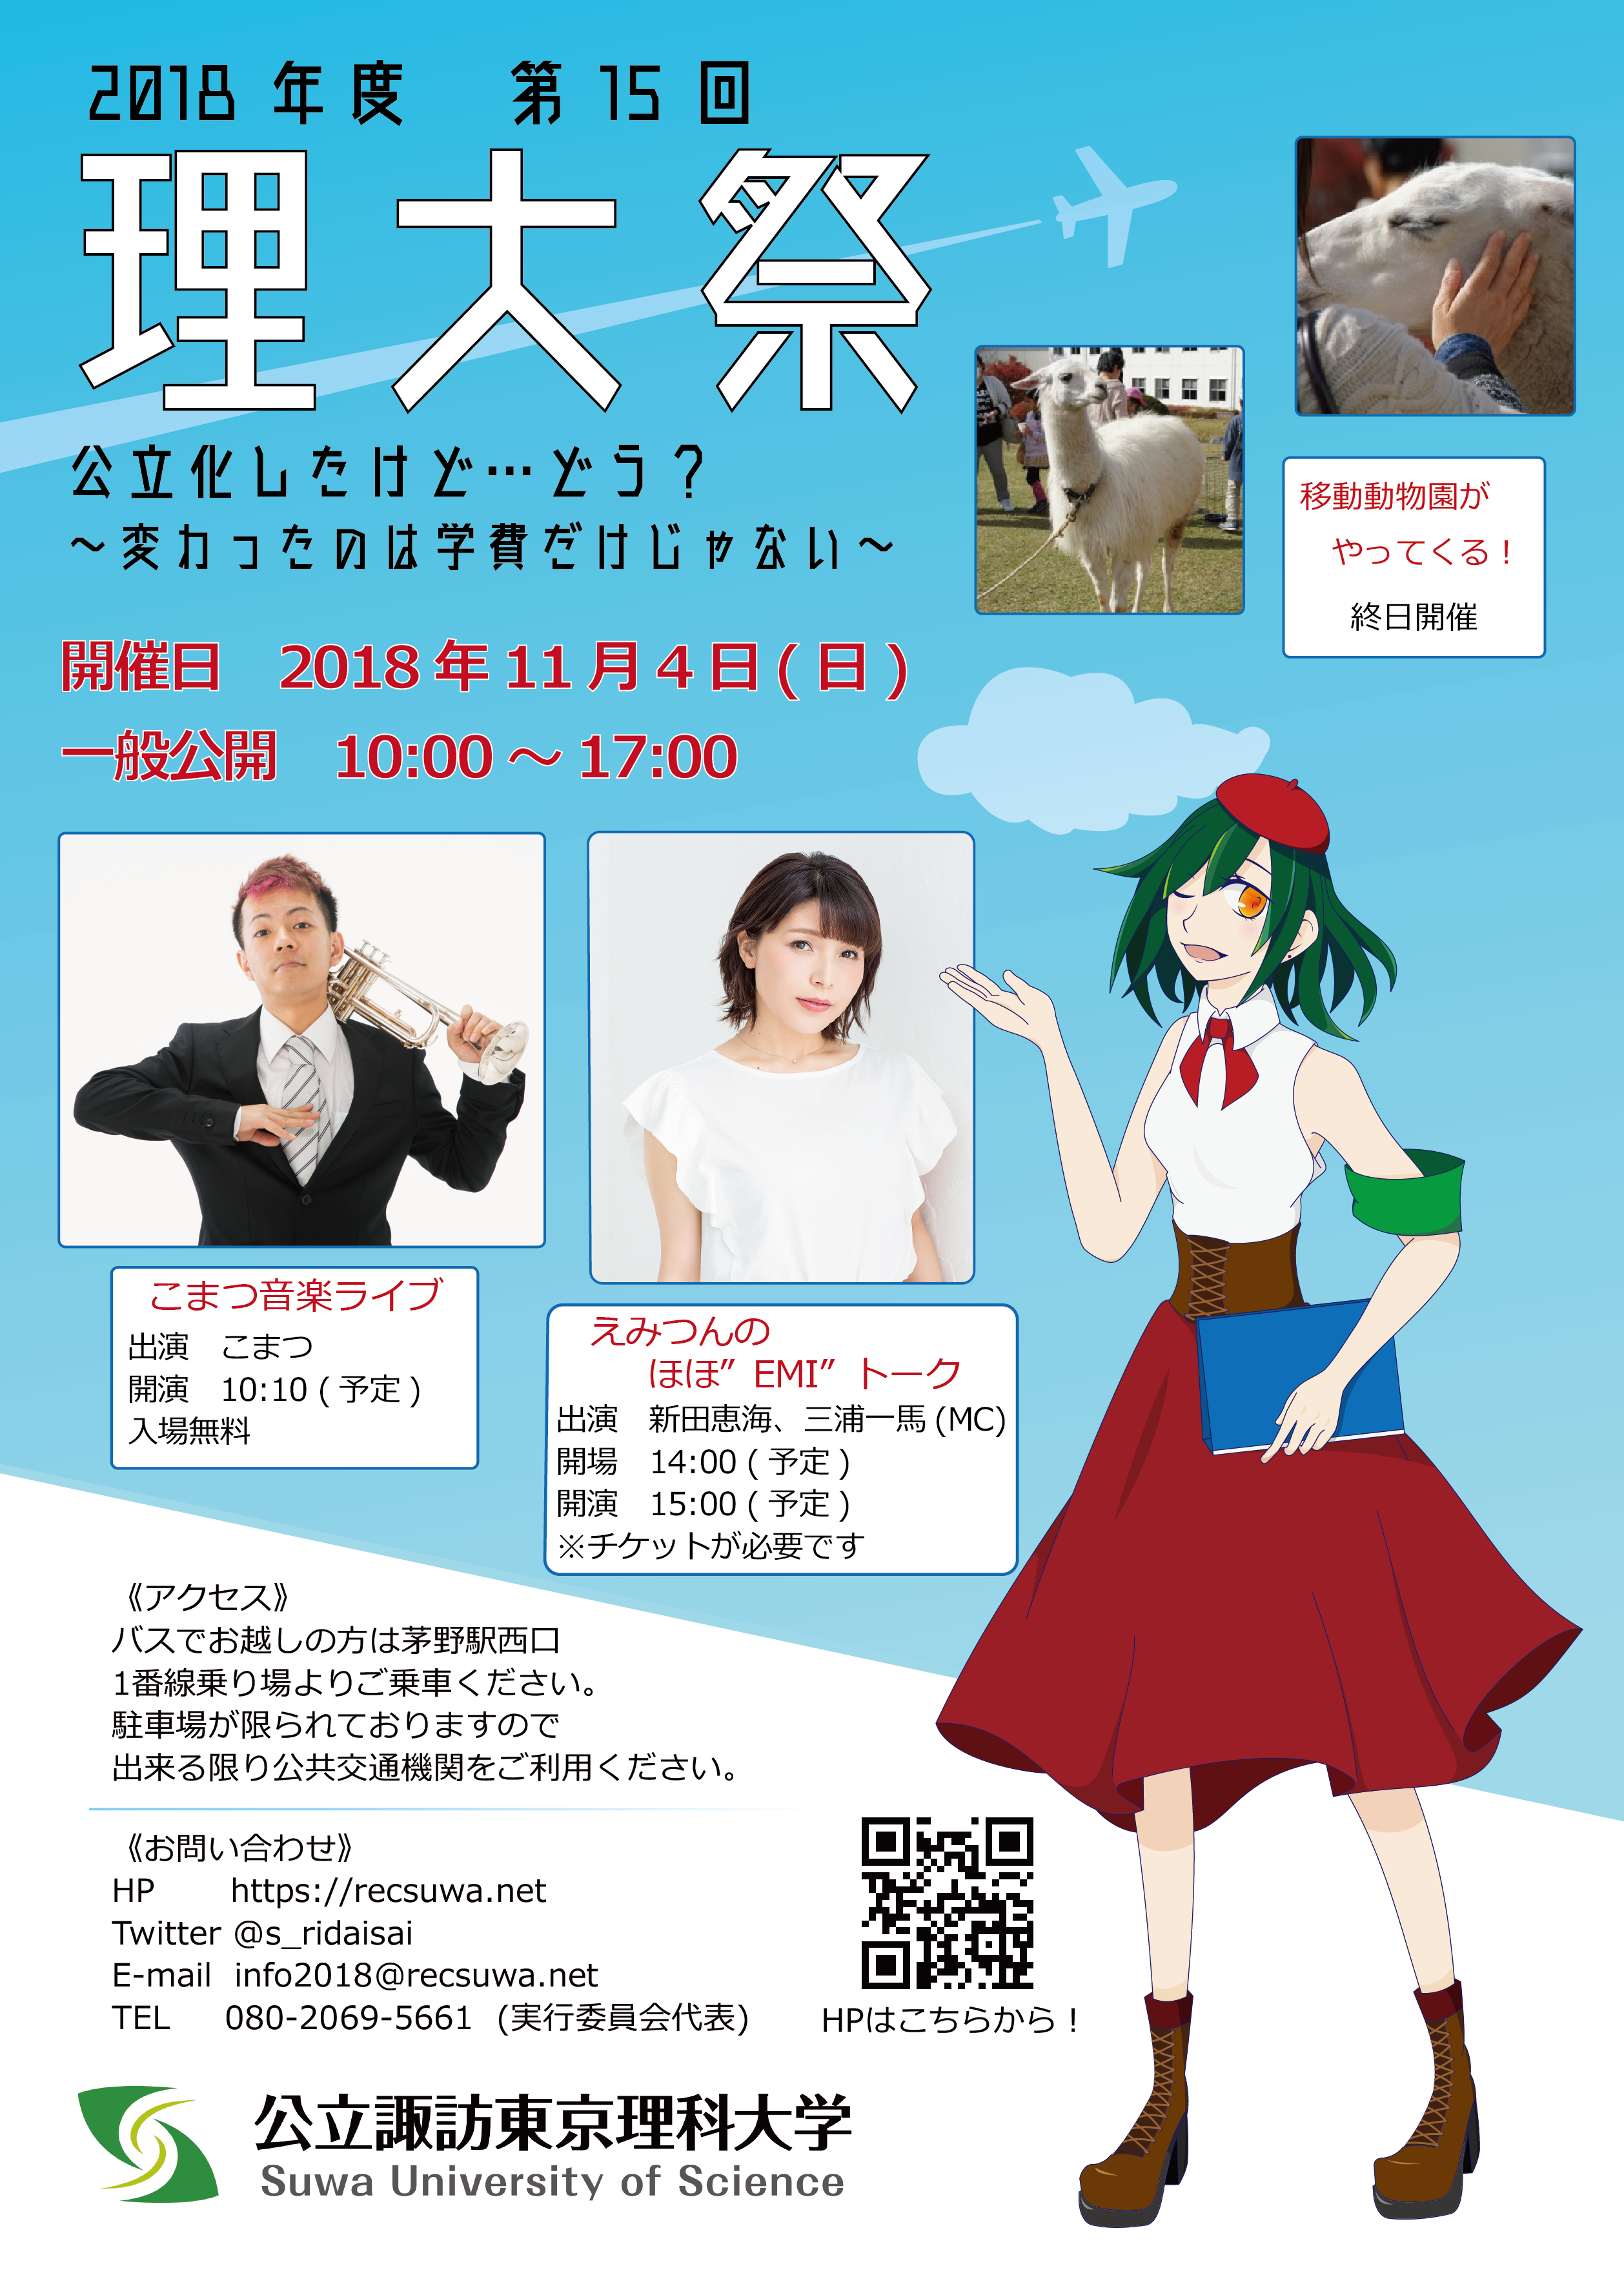 https   www.sus.ac.jp  always 1.0 https   www.sus.ac.jp topics library ... 472737be4bc48